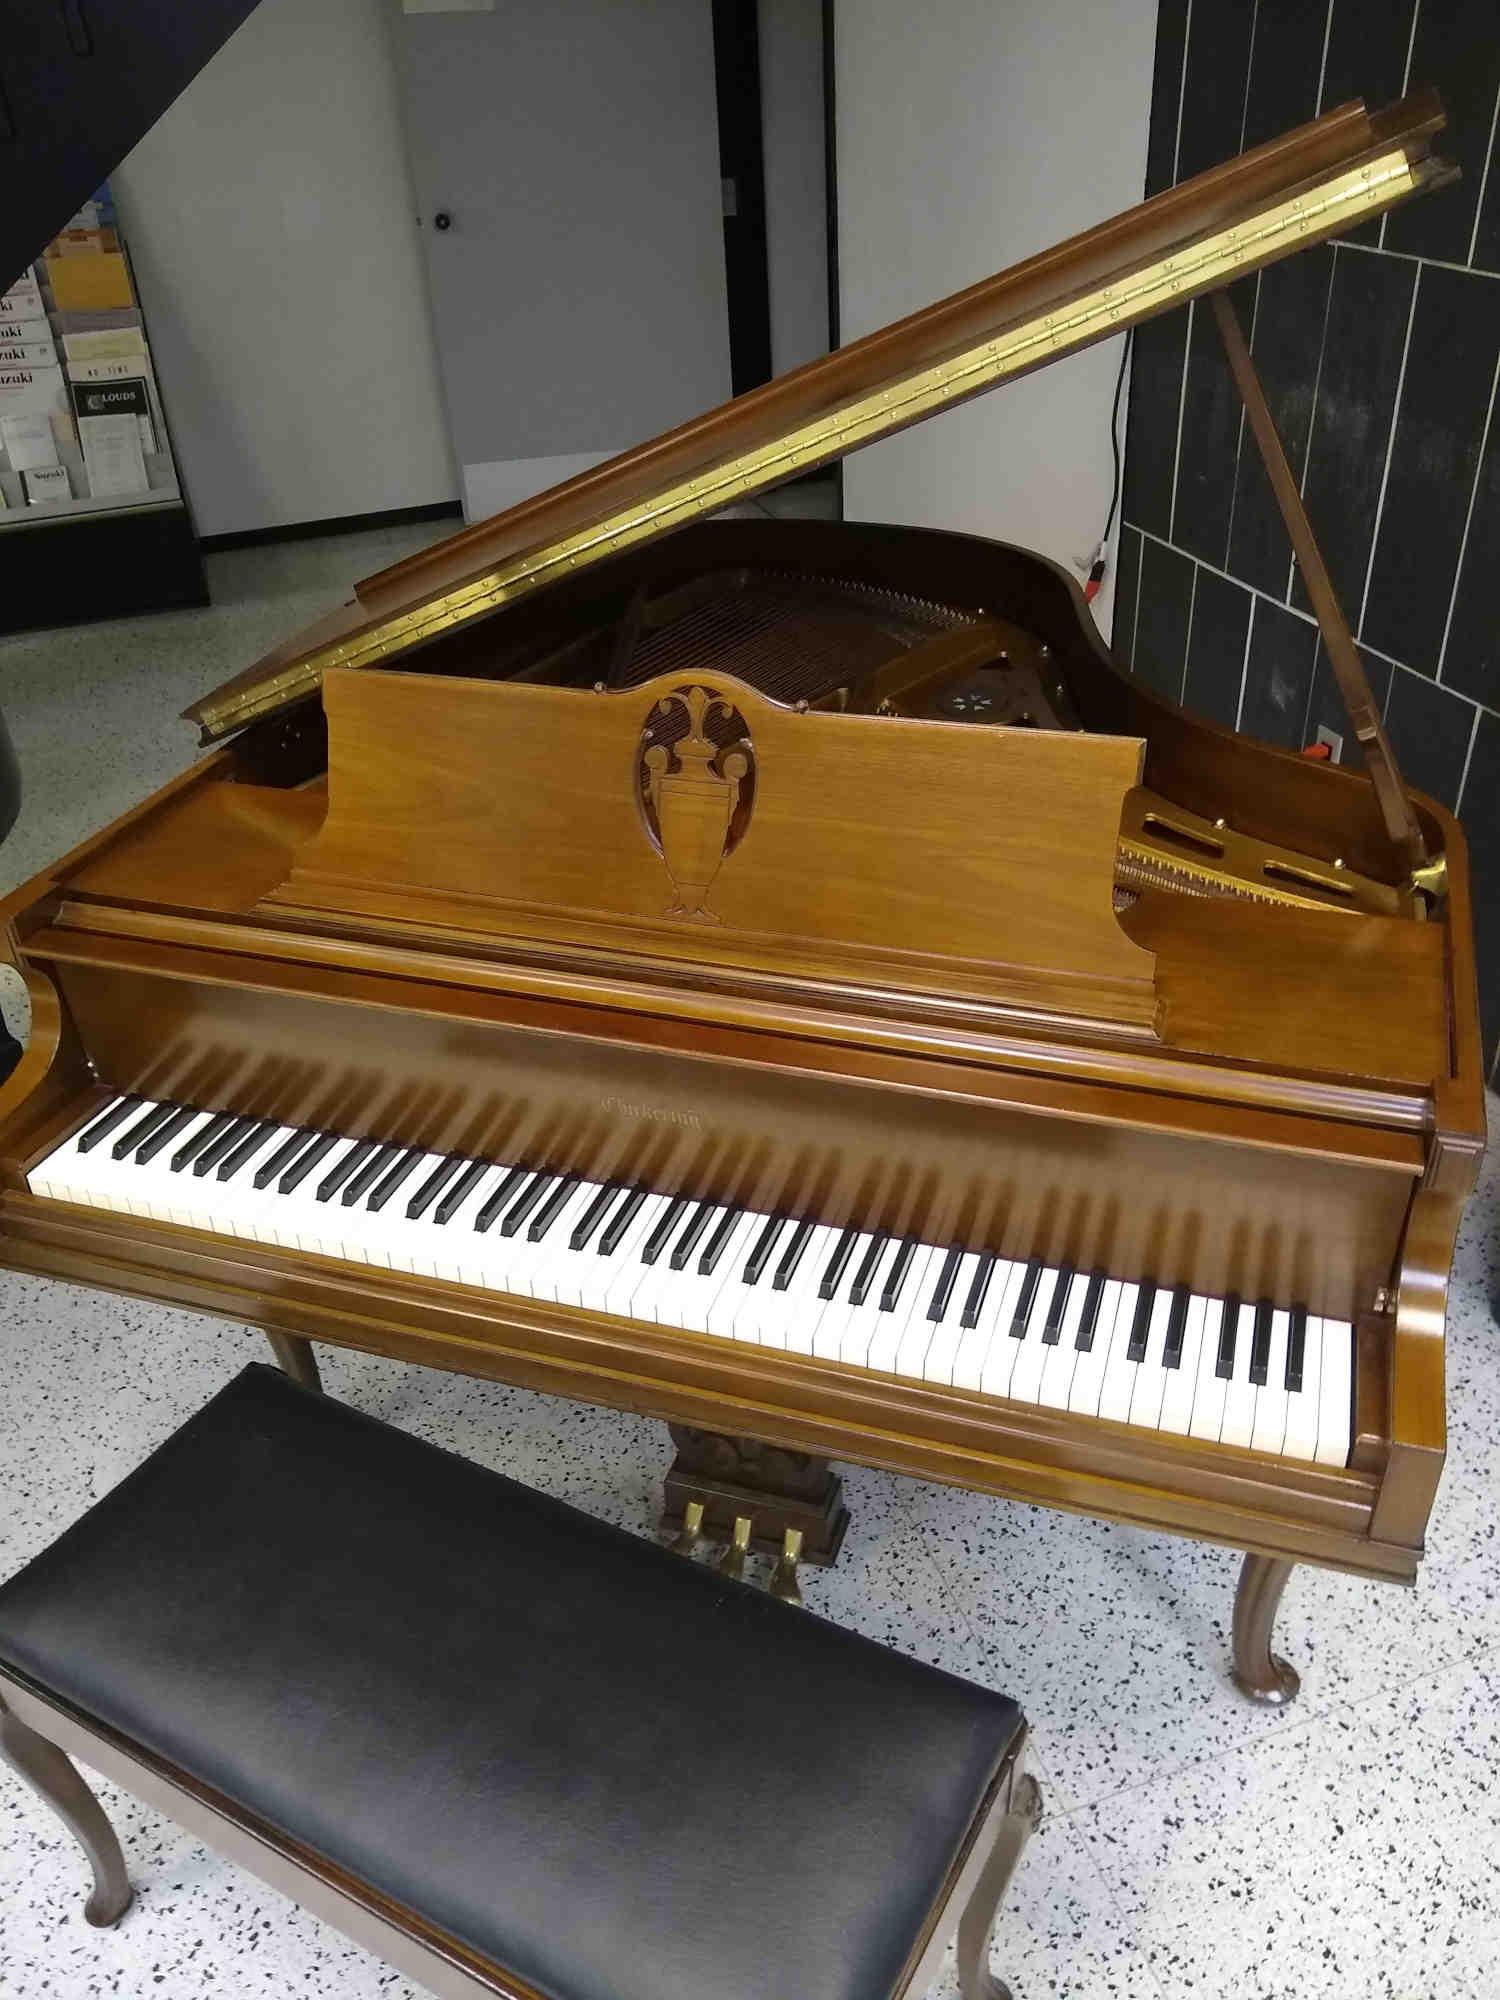 Chickering Grand Piano Art Case French Brown Cherry Finish